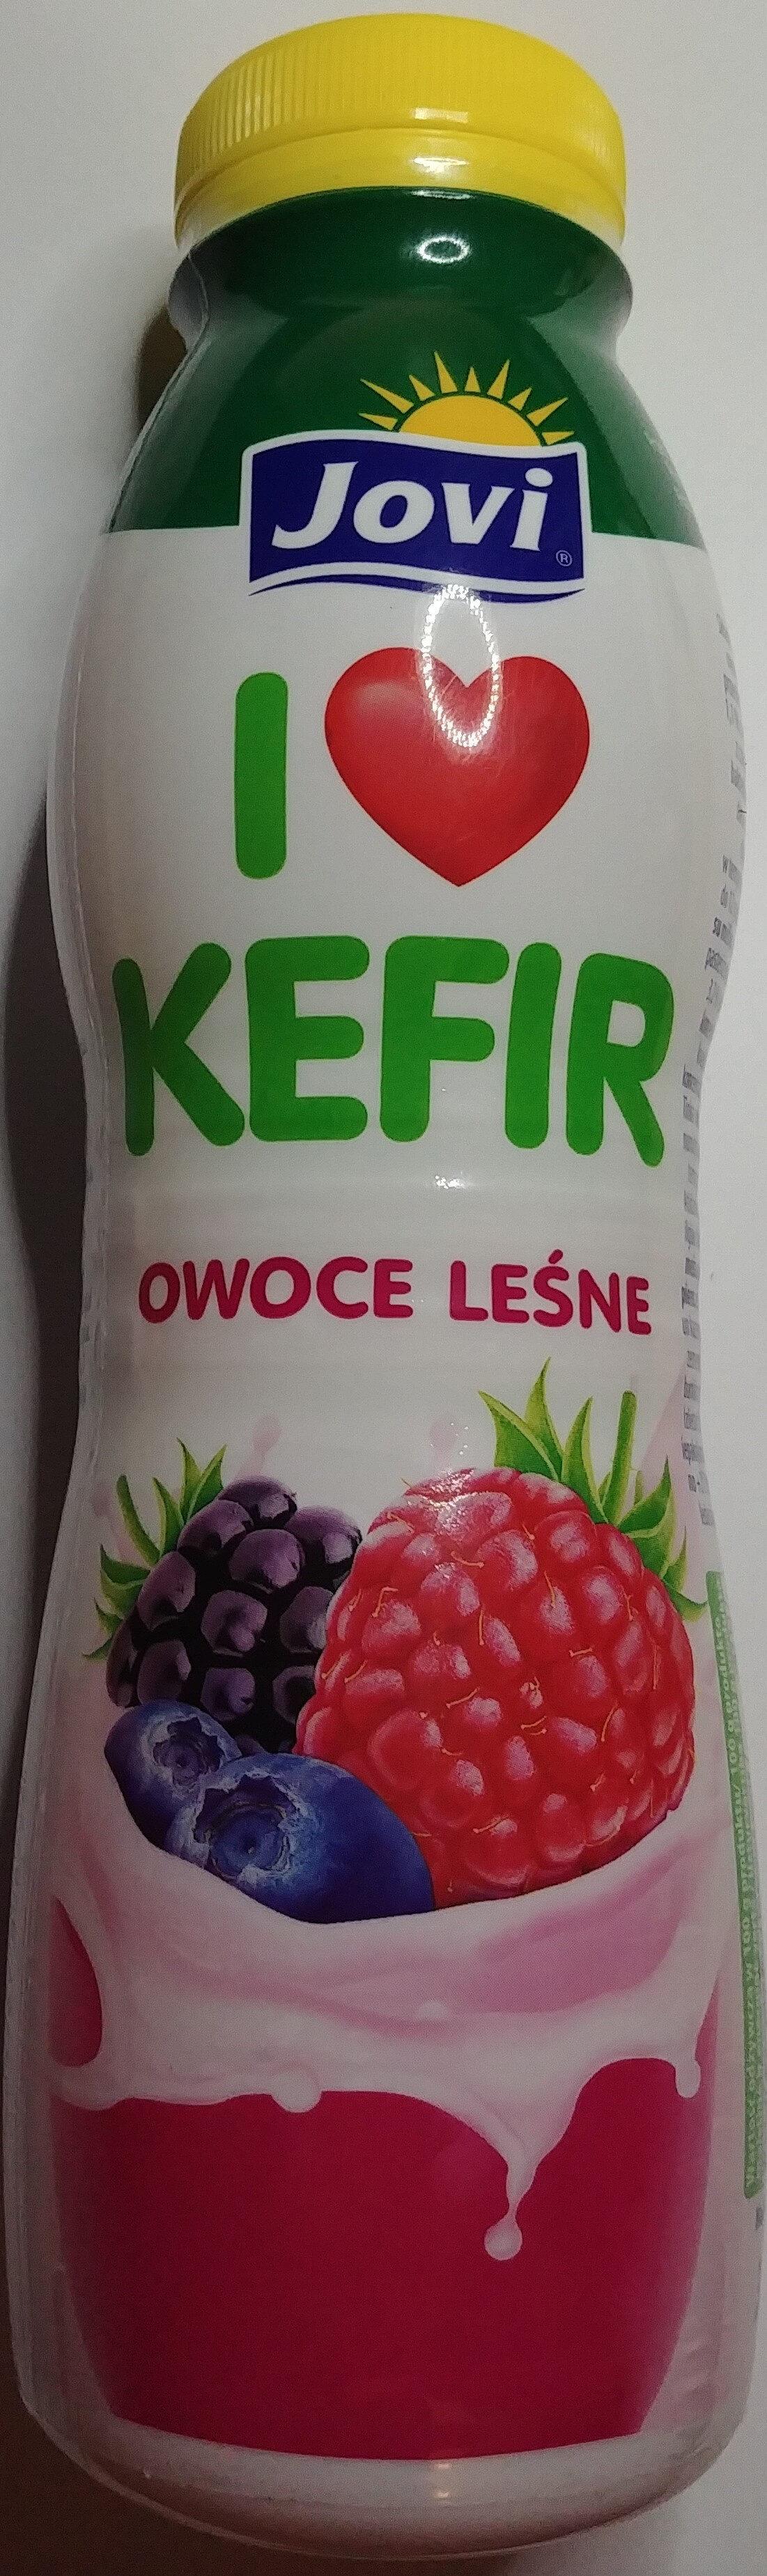 Kefir owoce leśne - Produkt